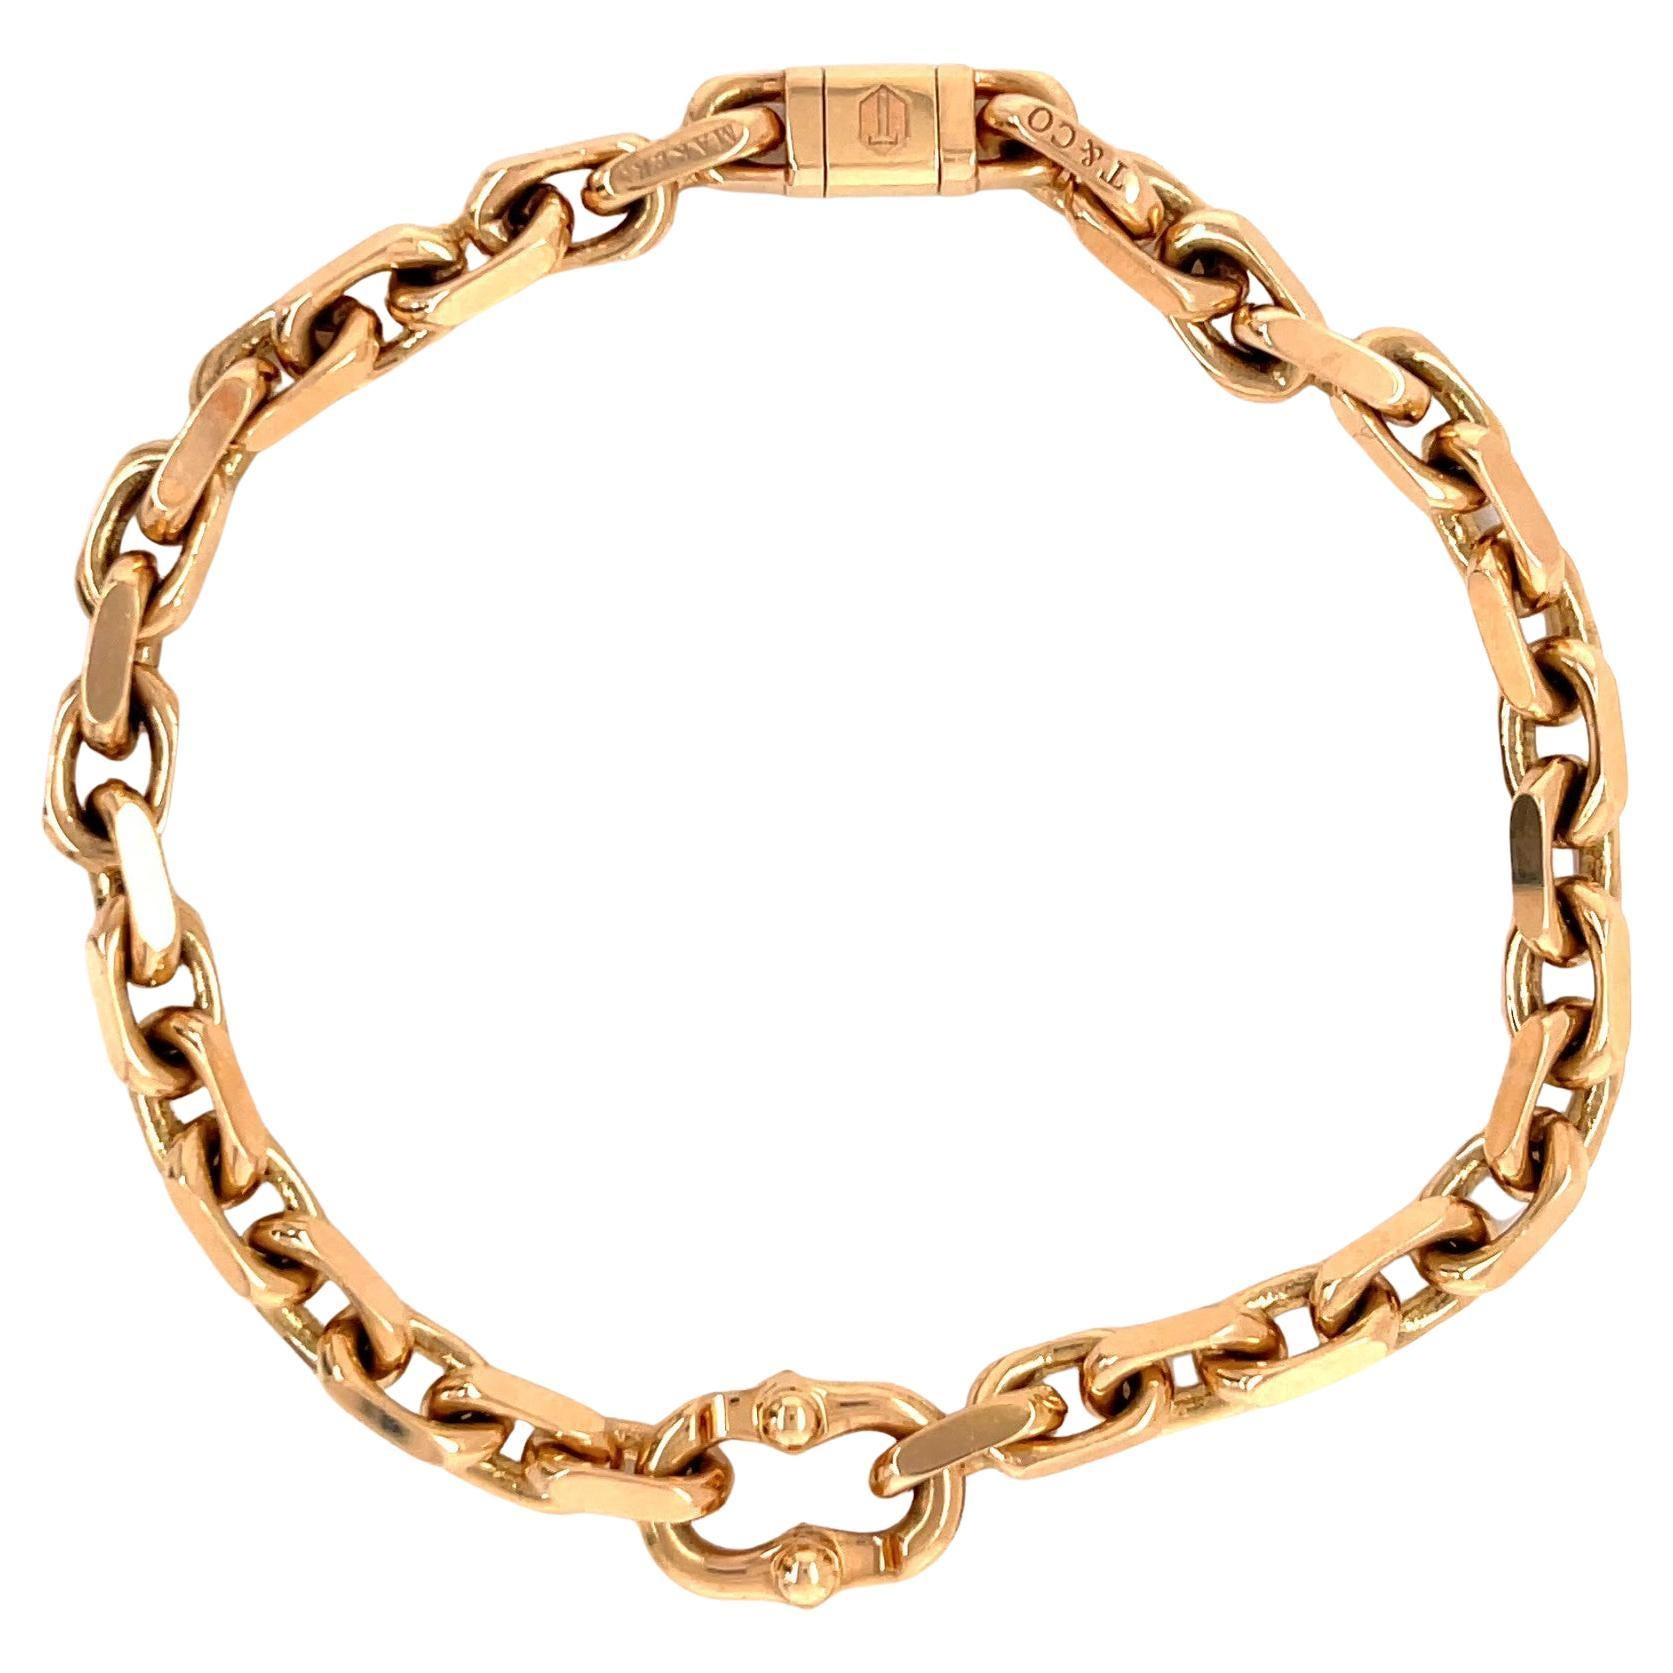 Vintage Tiffany & Co. Germany 18 Karat Rose Gold Bracelet